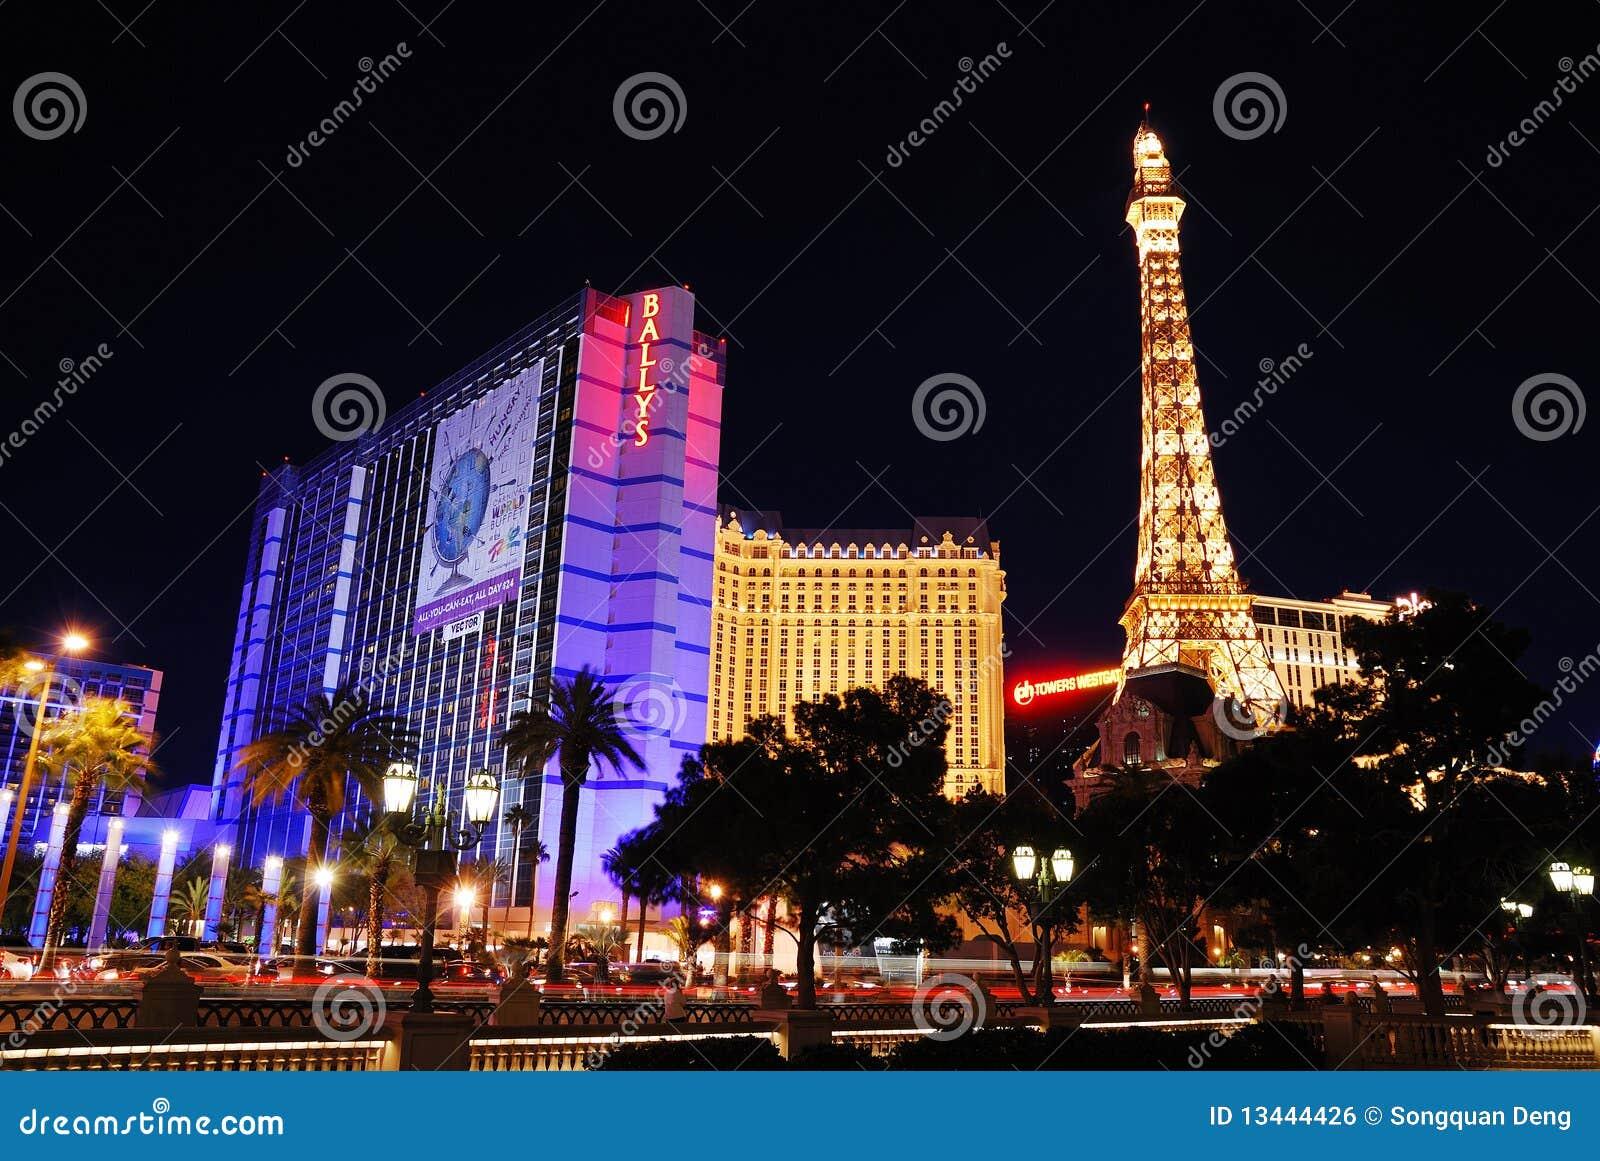 Eiffel Tower Paris And Ballys Hotel In Las Vegas Editorial